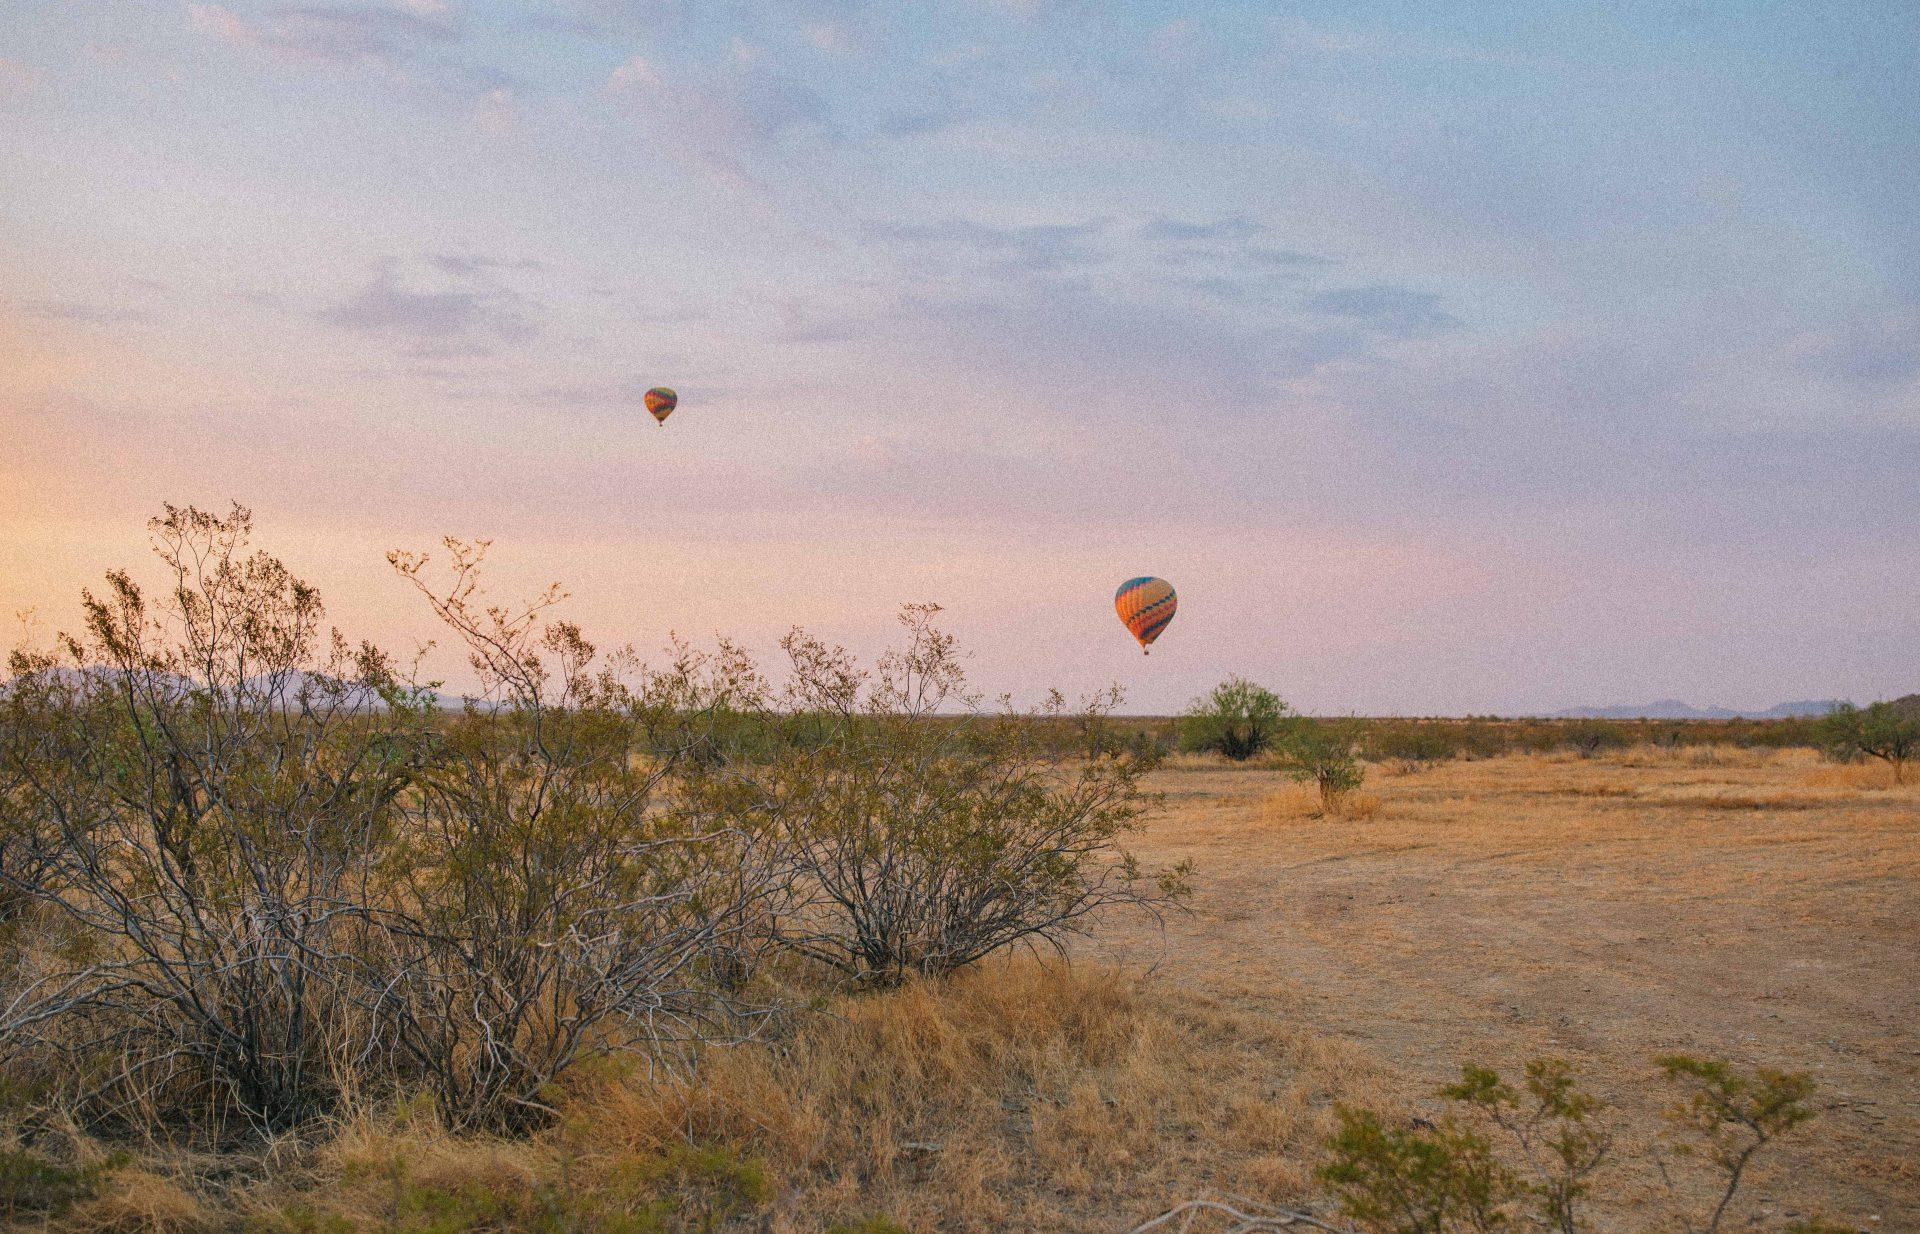 scottsdale Arizona, scottsdale, travel guide, travel blogger, what to do in scottsdale Arizona, hot air ballon, hot air balloon in Arizona, hot air balloon expedition scottsdale, ultimate guide to scottsdale, itinerary